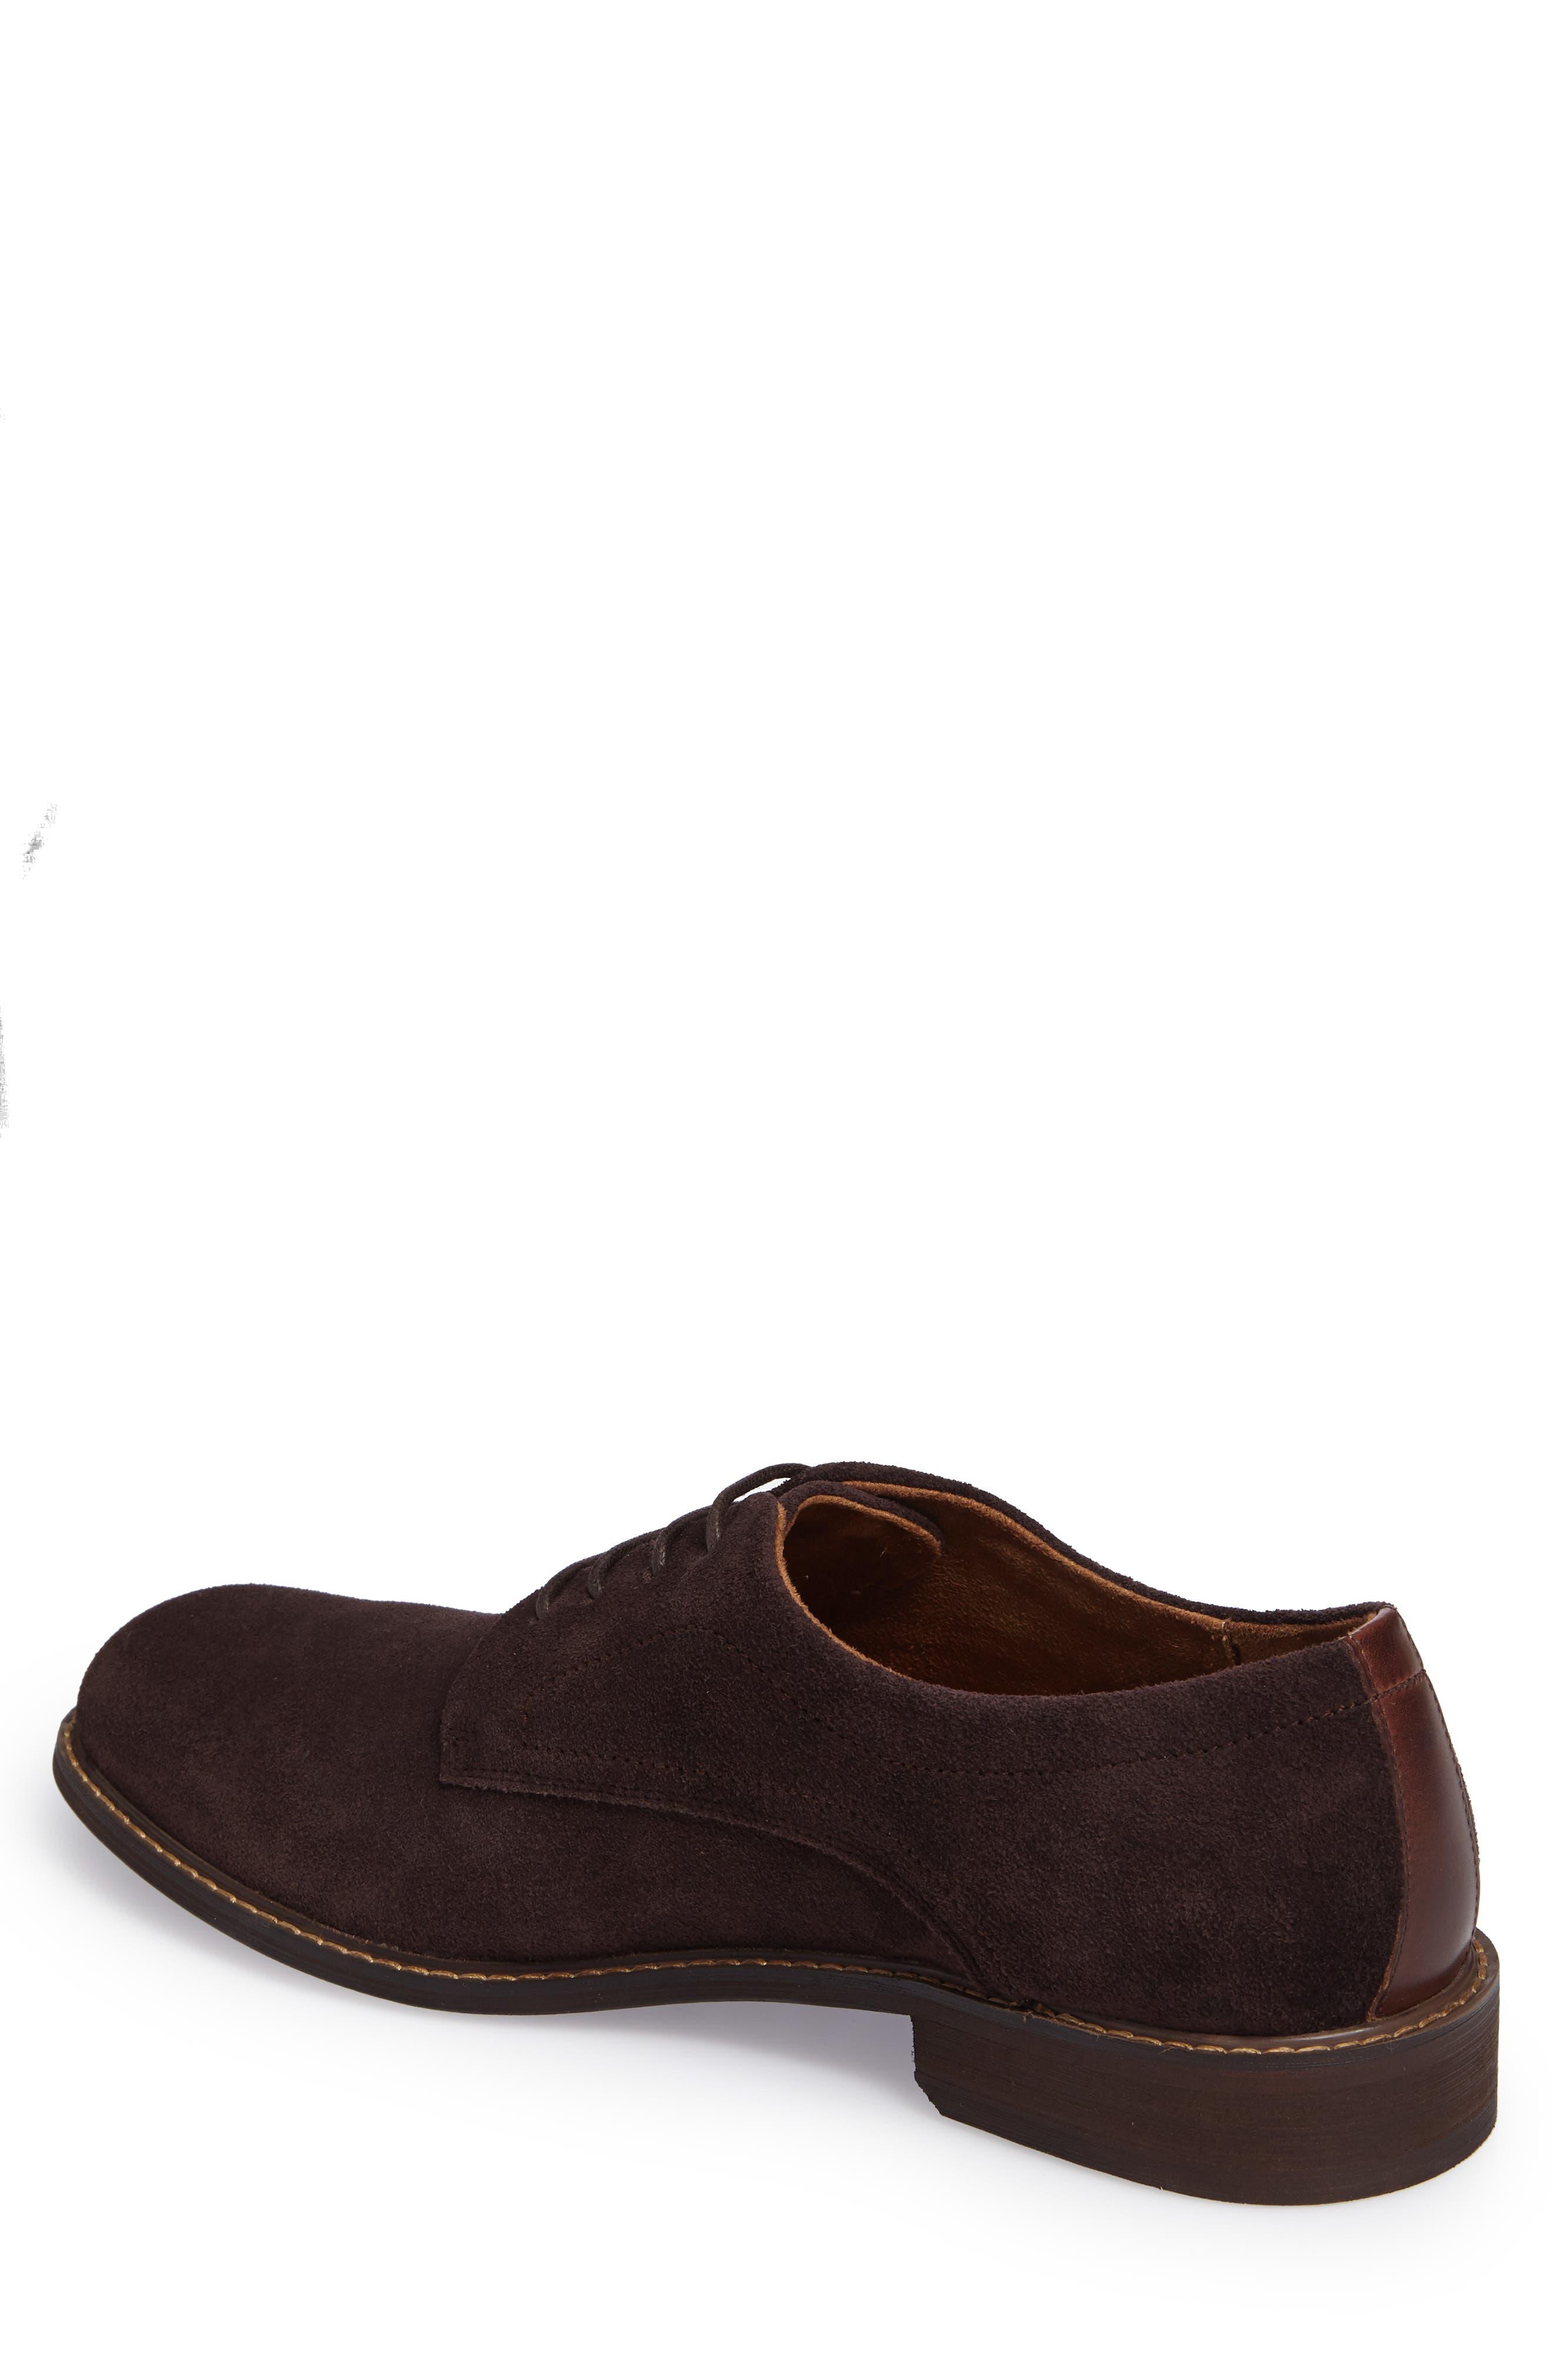 Buck Shoe,                             Alternate thumbnail 2, color,                             Chocolate Suede